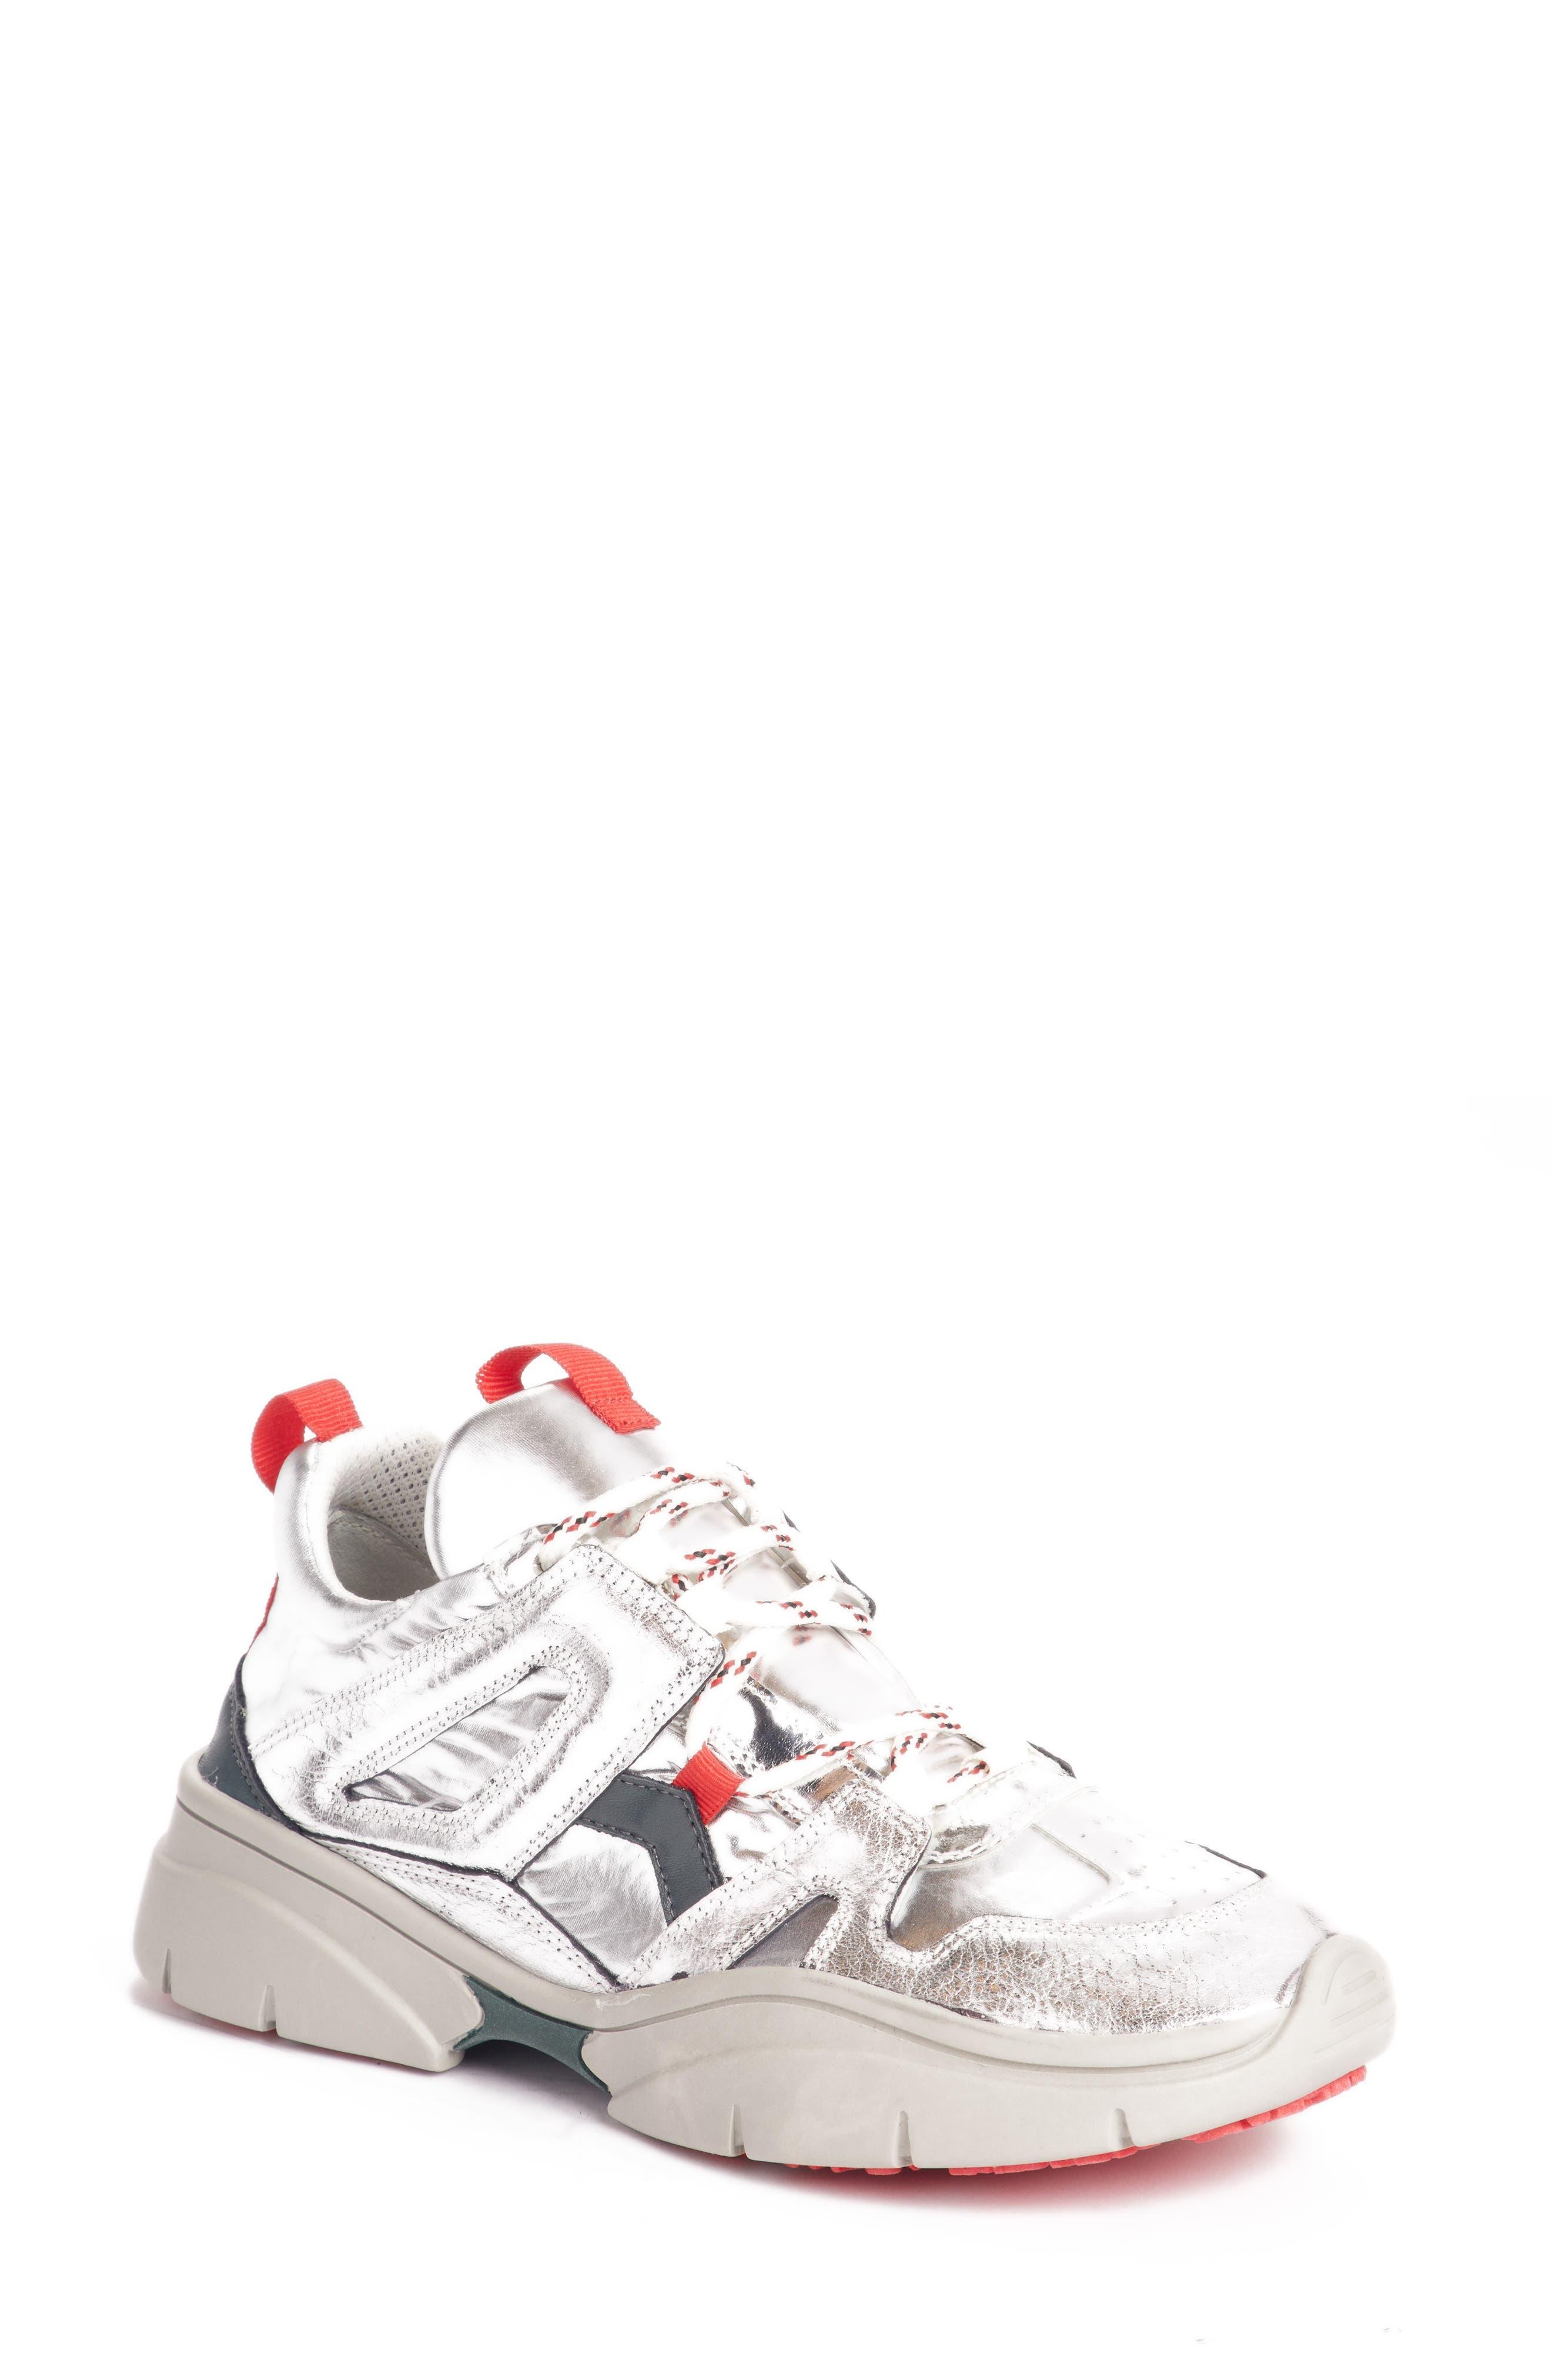 Kindsay Sneaker, Main, color, 040